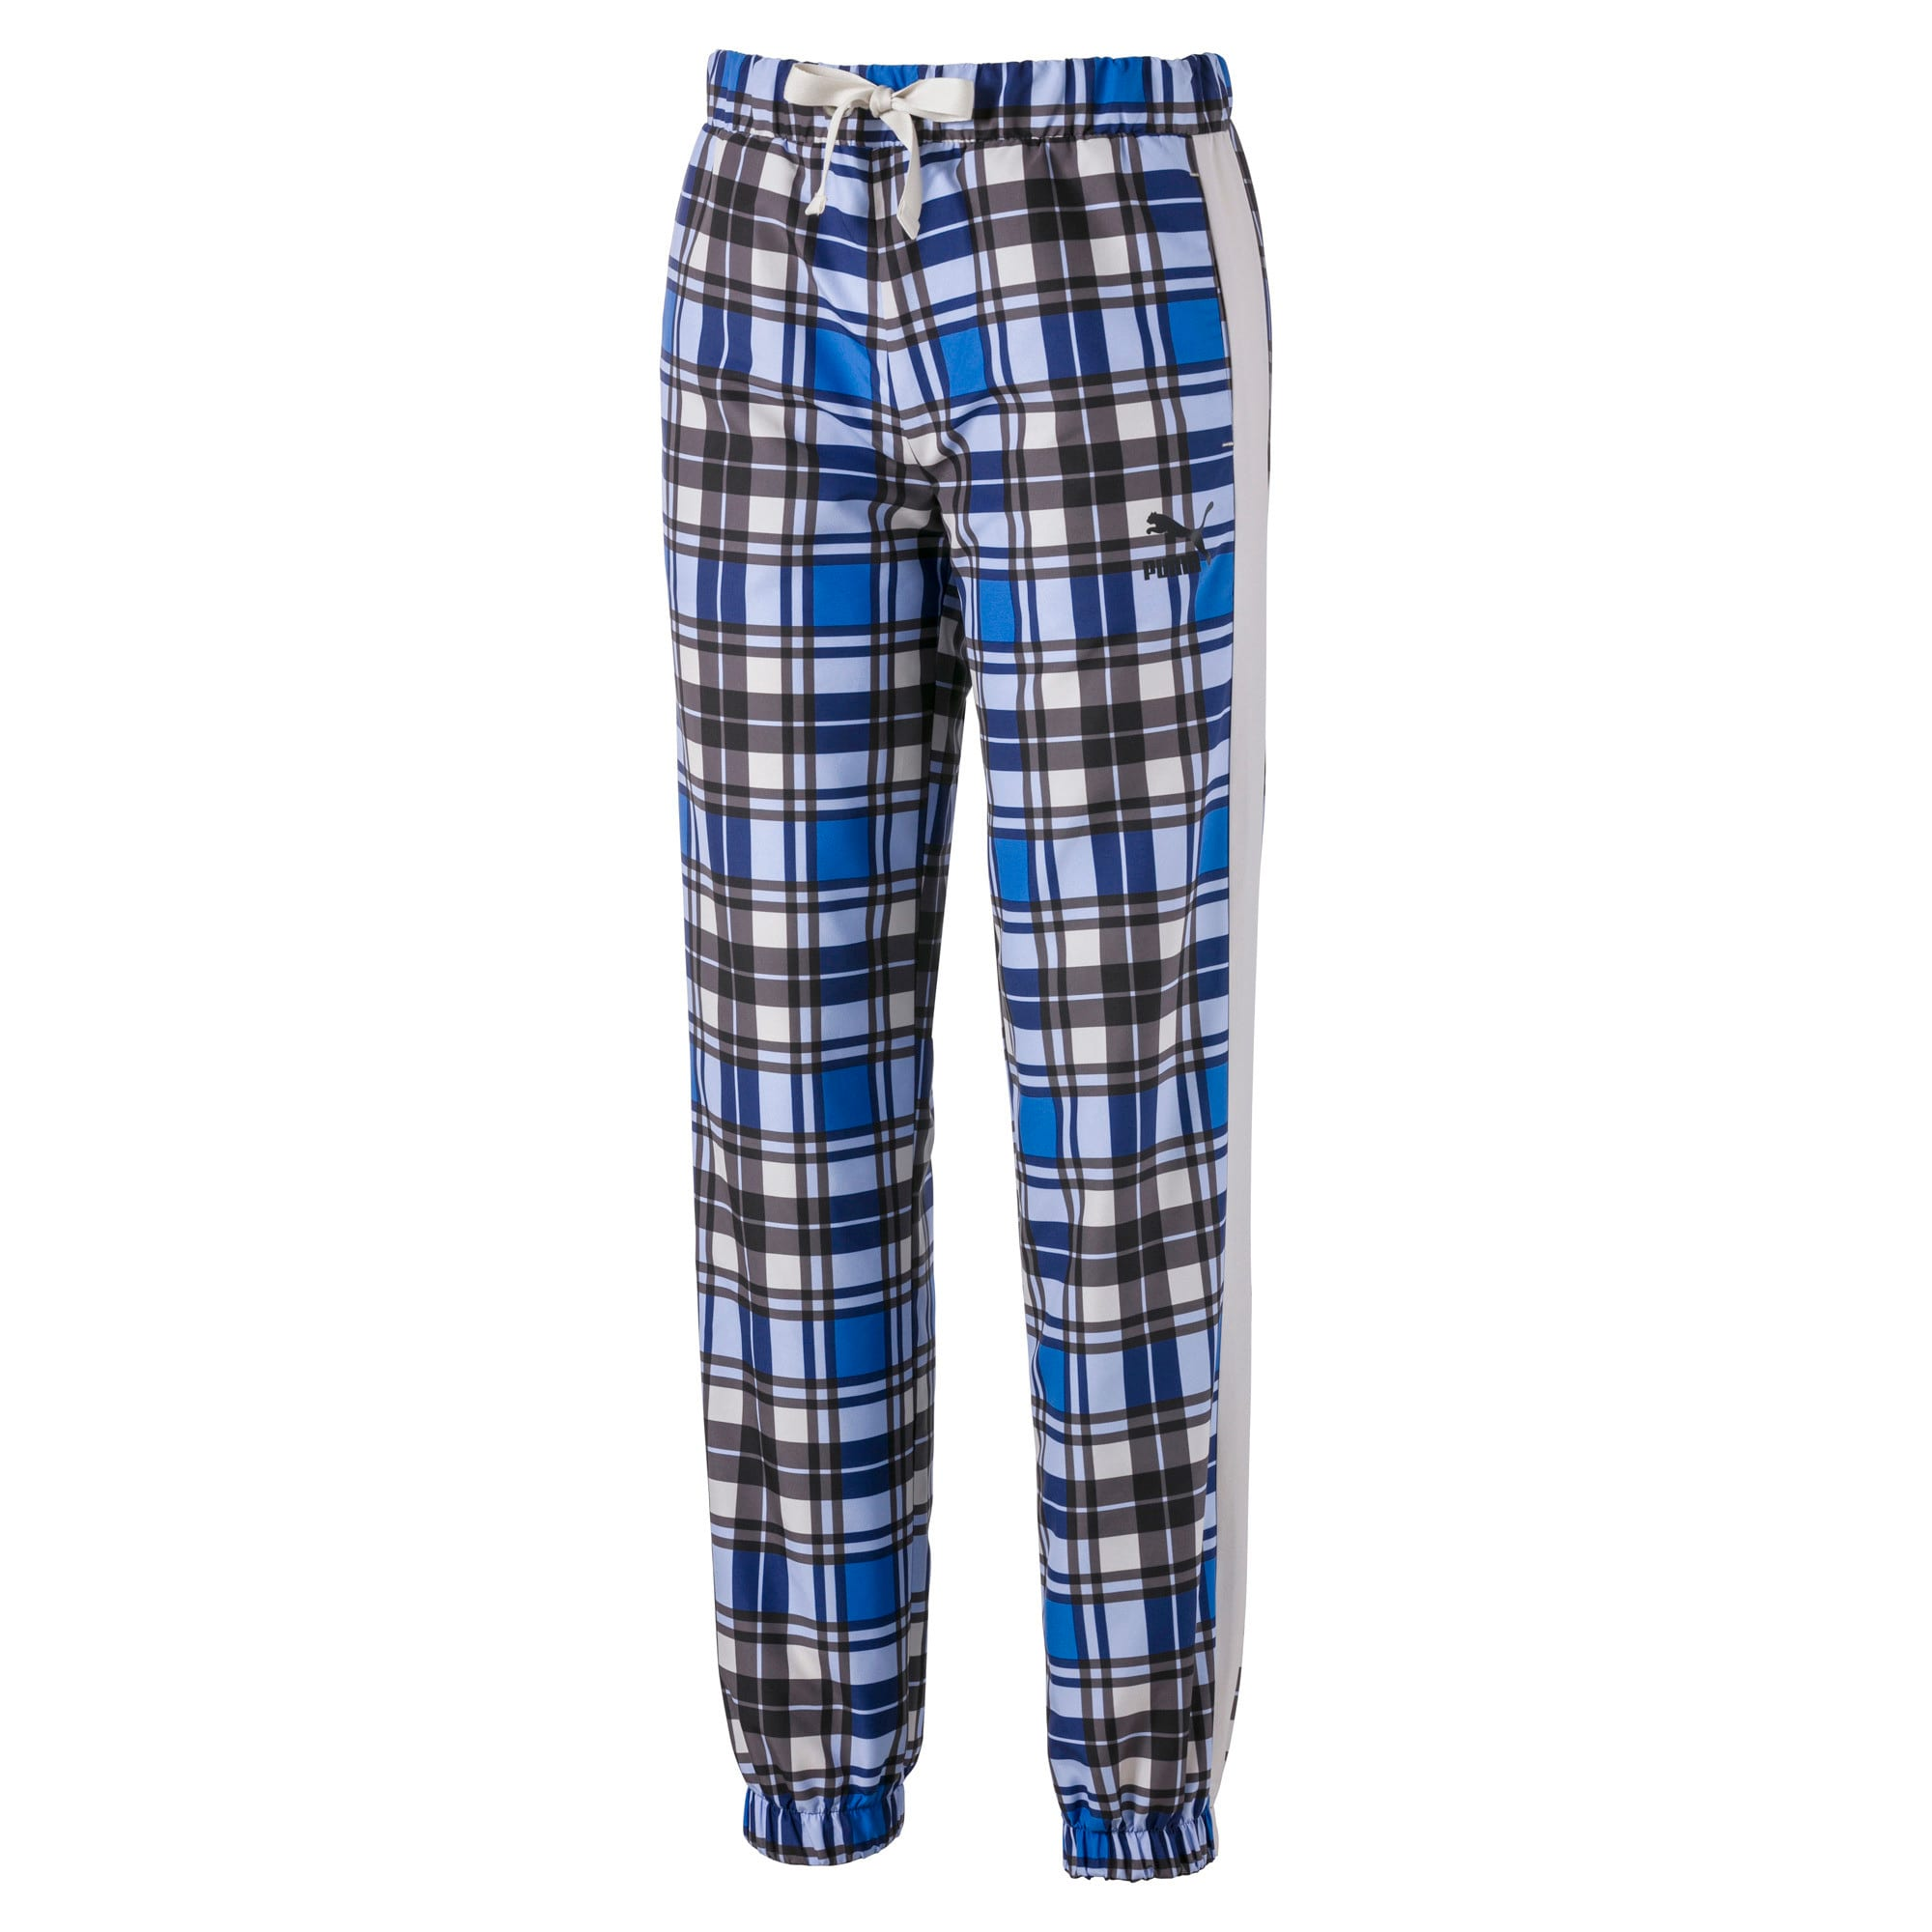 Anteprima 2 di Check Woven Women's Jog Pants, Strong Blue, medio